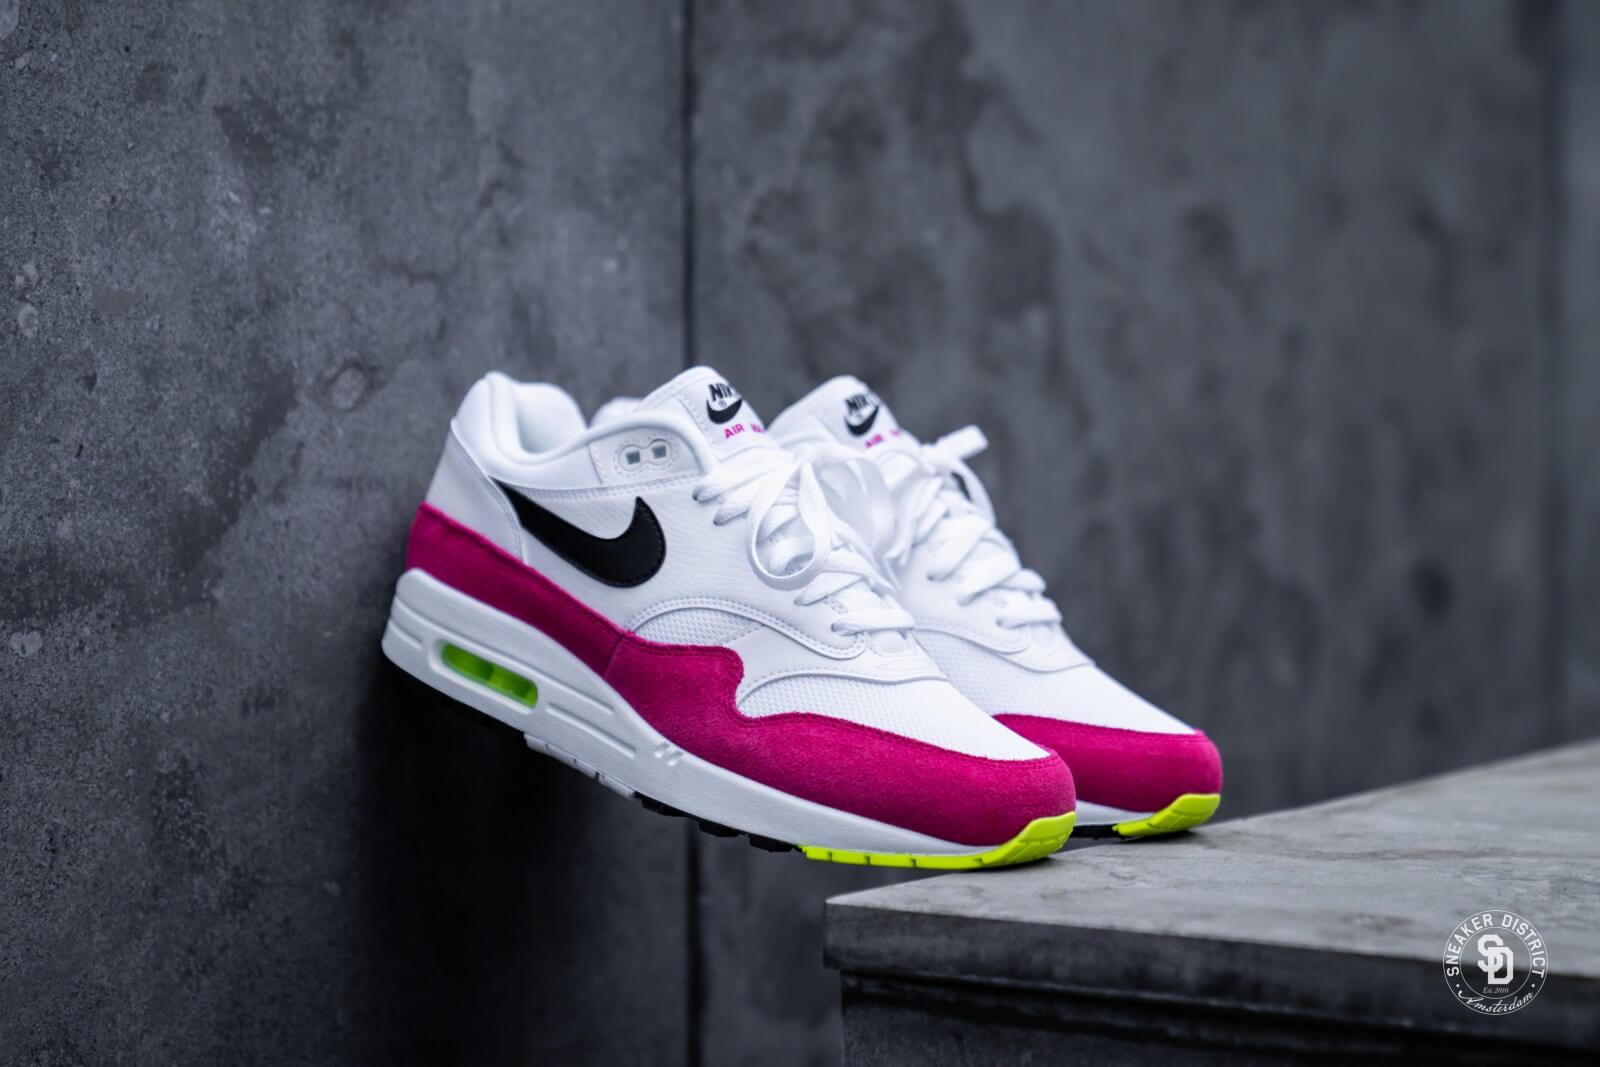 Nike Air Max 1 WhiteBlack Volt Pink Rush AH8145 111